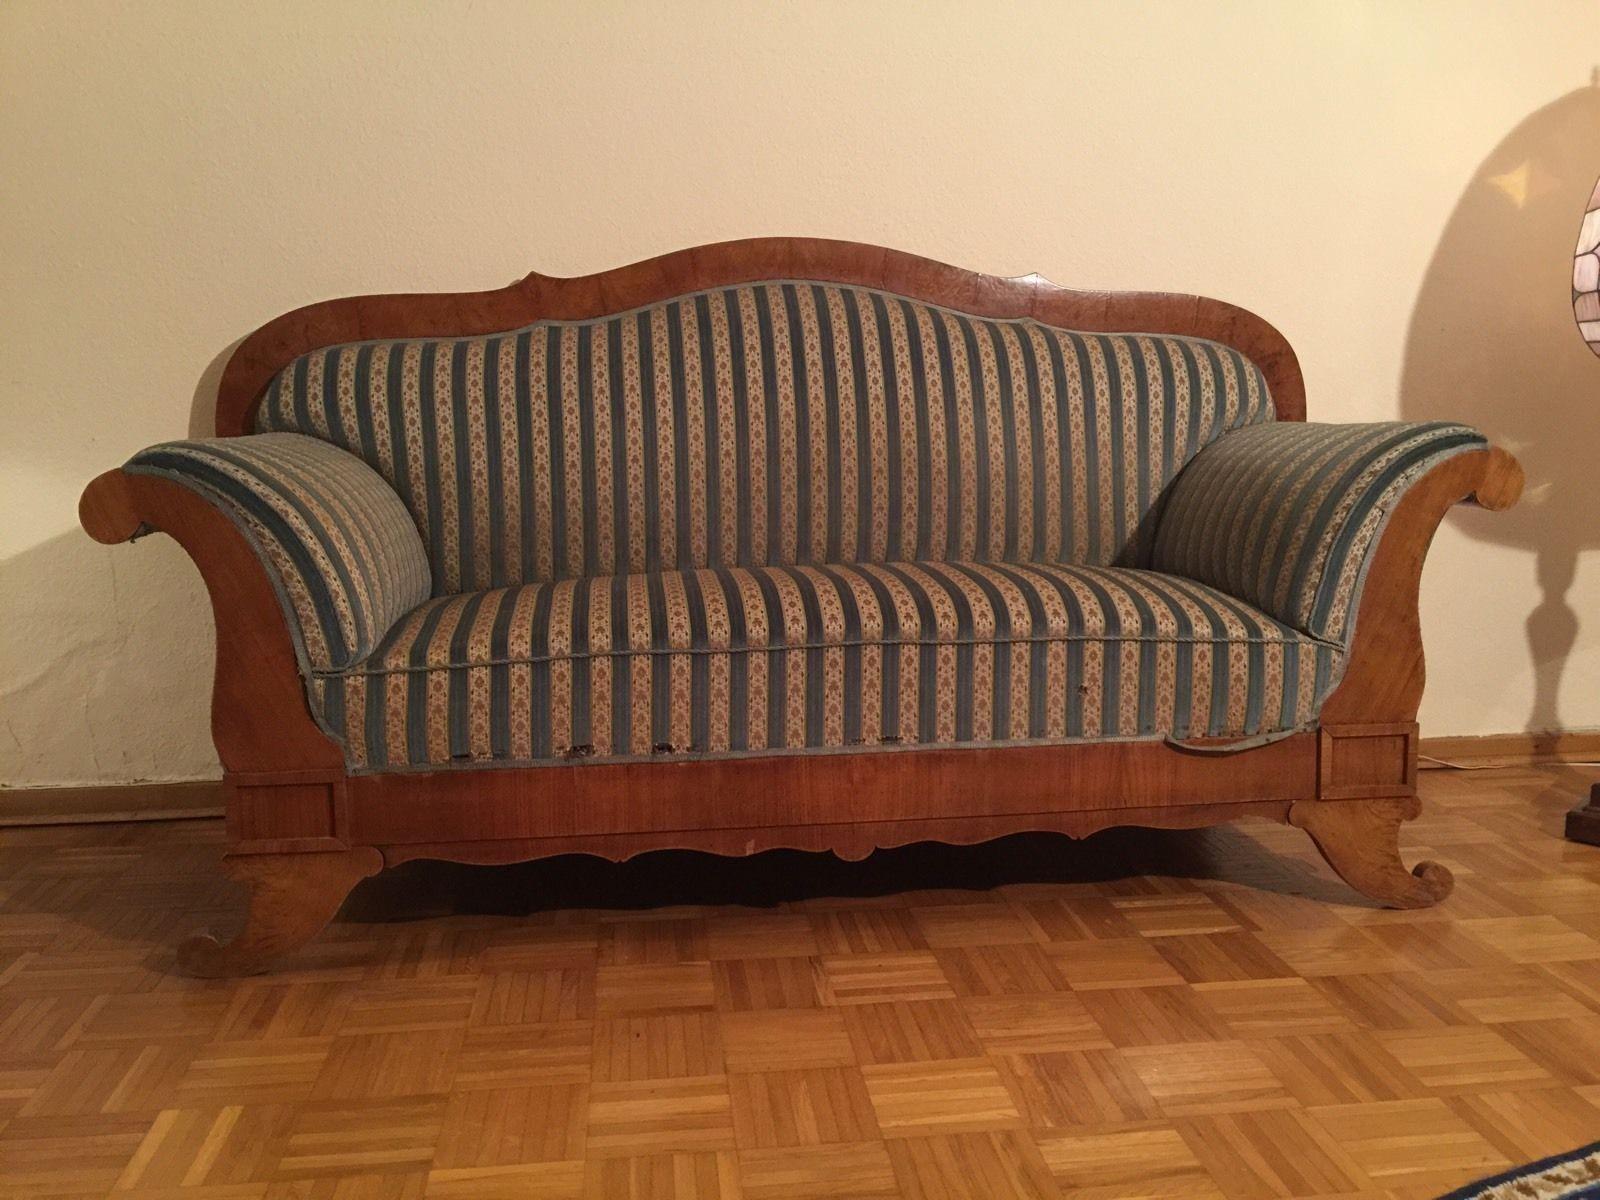 Replacement Sofa Cushions Laura Ashley Dry Cleaner In South Delhi Ebay Antikes Biedermeier диваны Pinterest